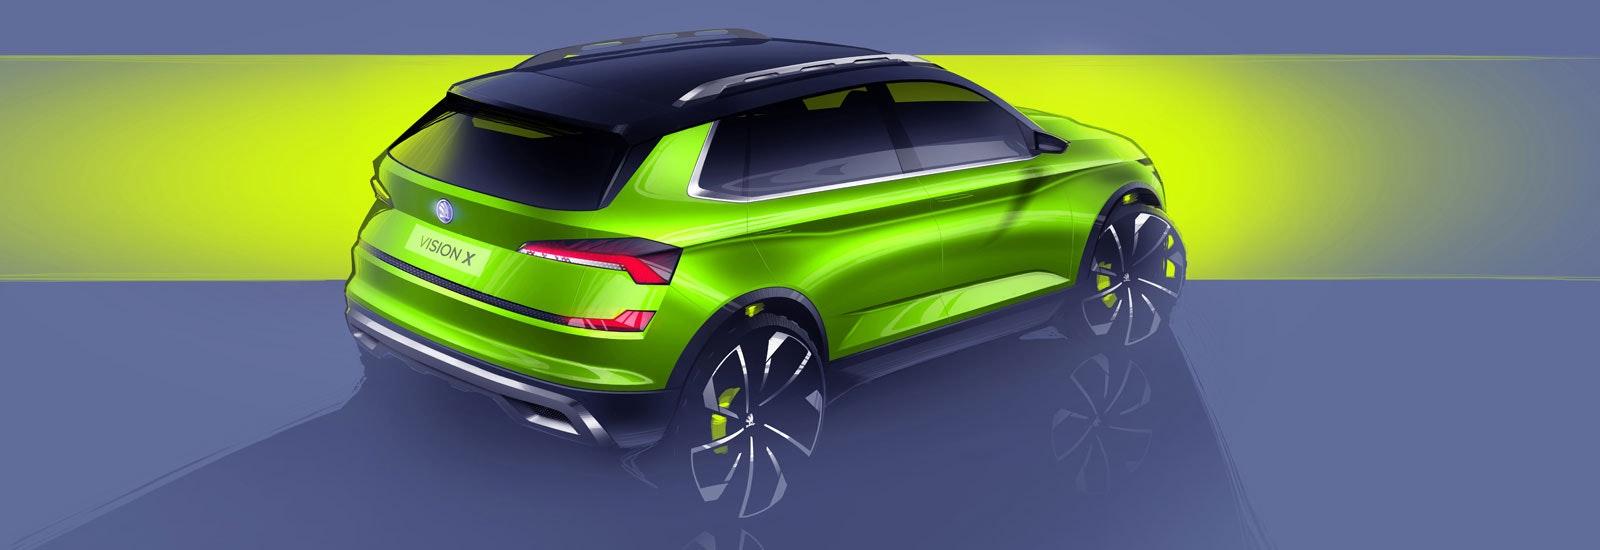 2018 Skoda Fabia SUV Vision X price & release date